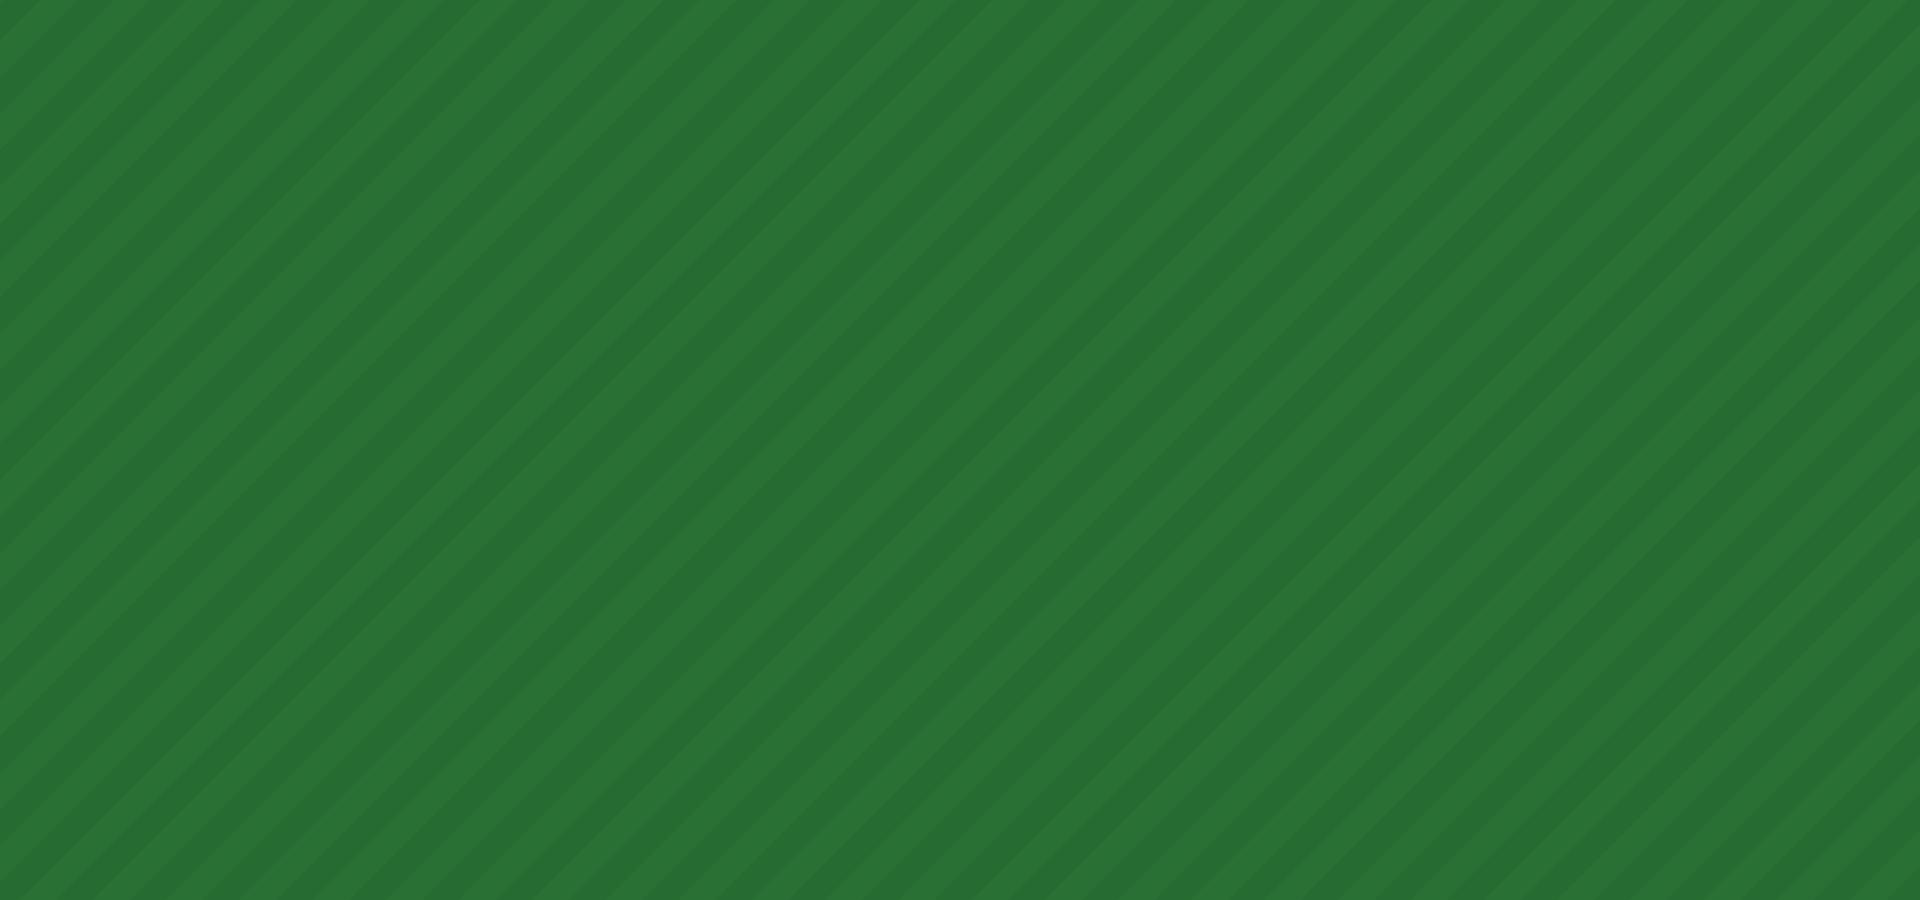 d3-placeholder-1920